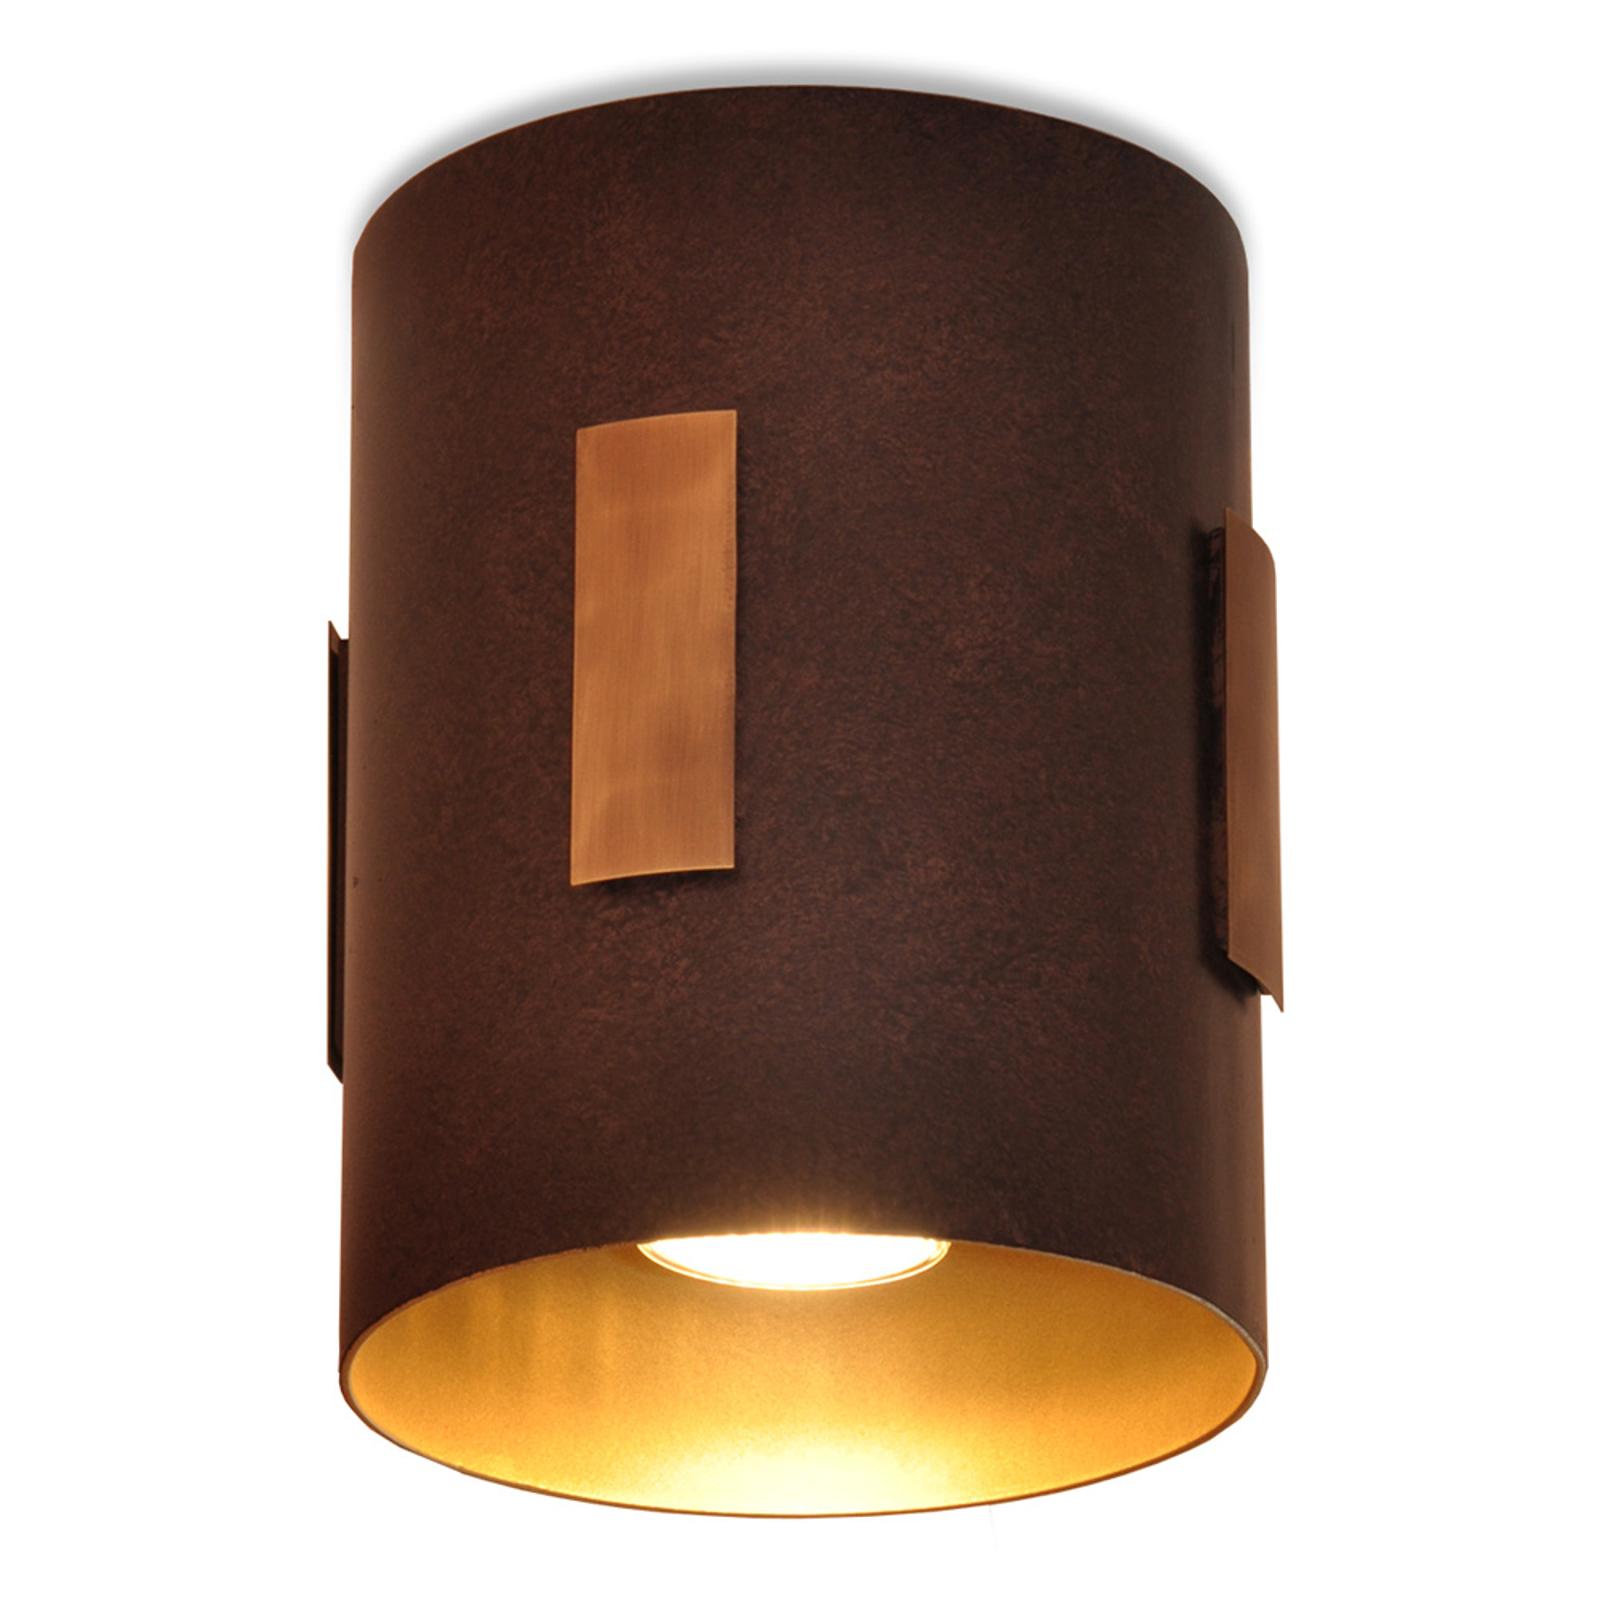 Menzel Solo taklampa brun/svart/guld